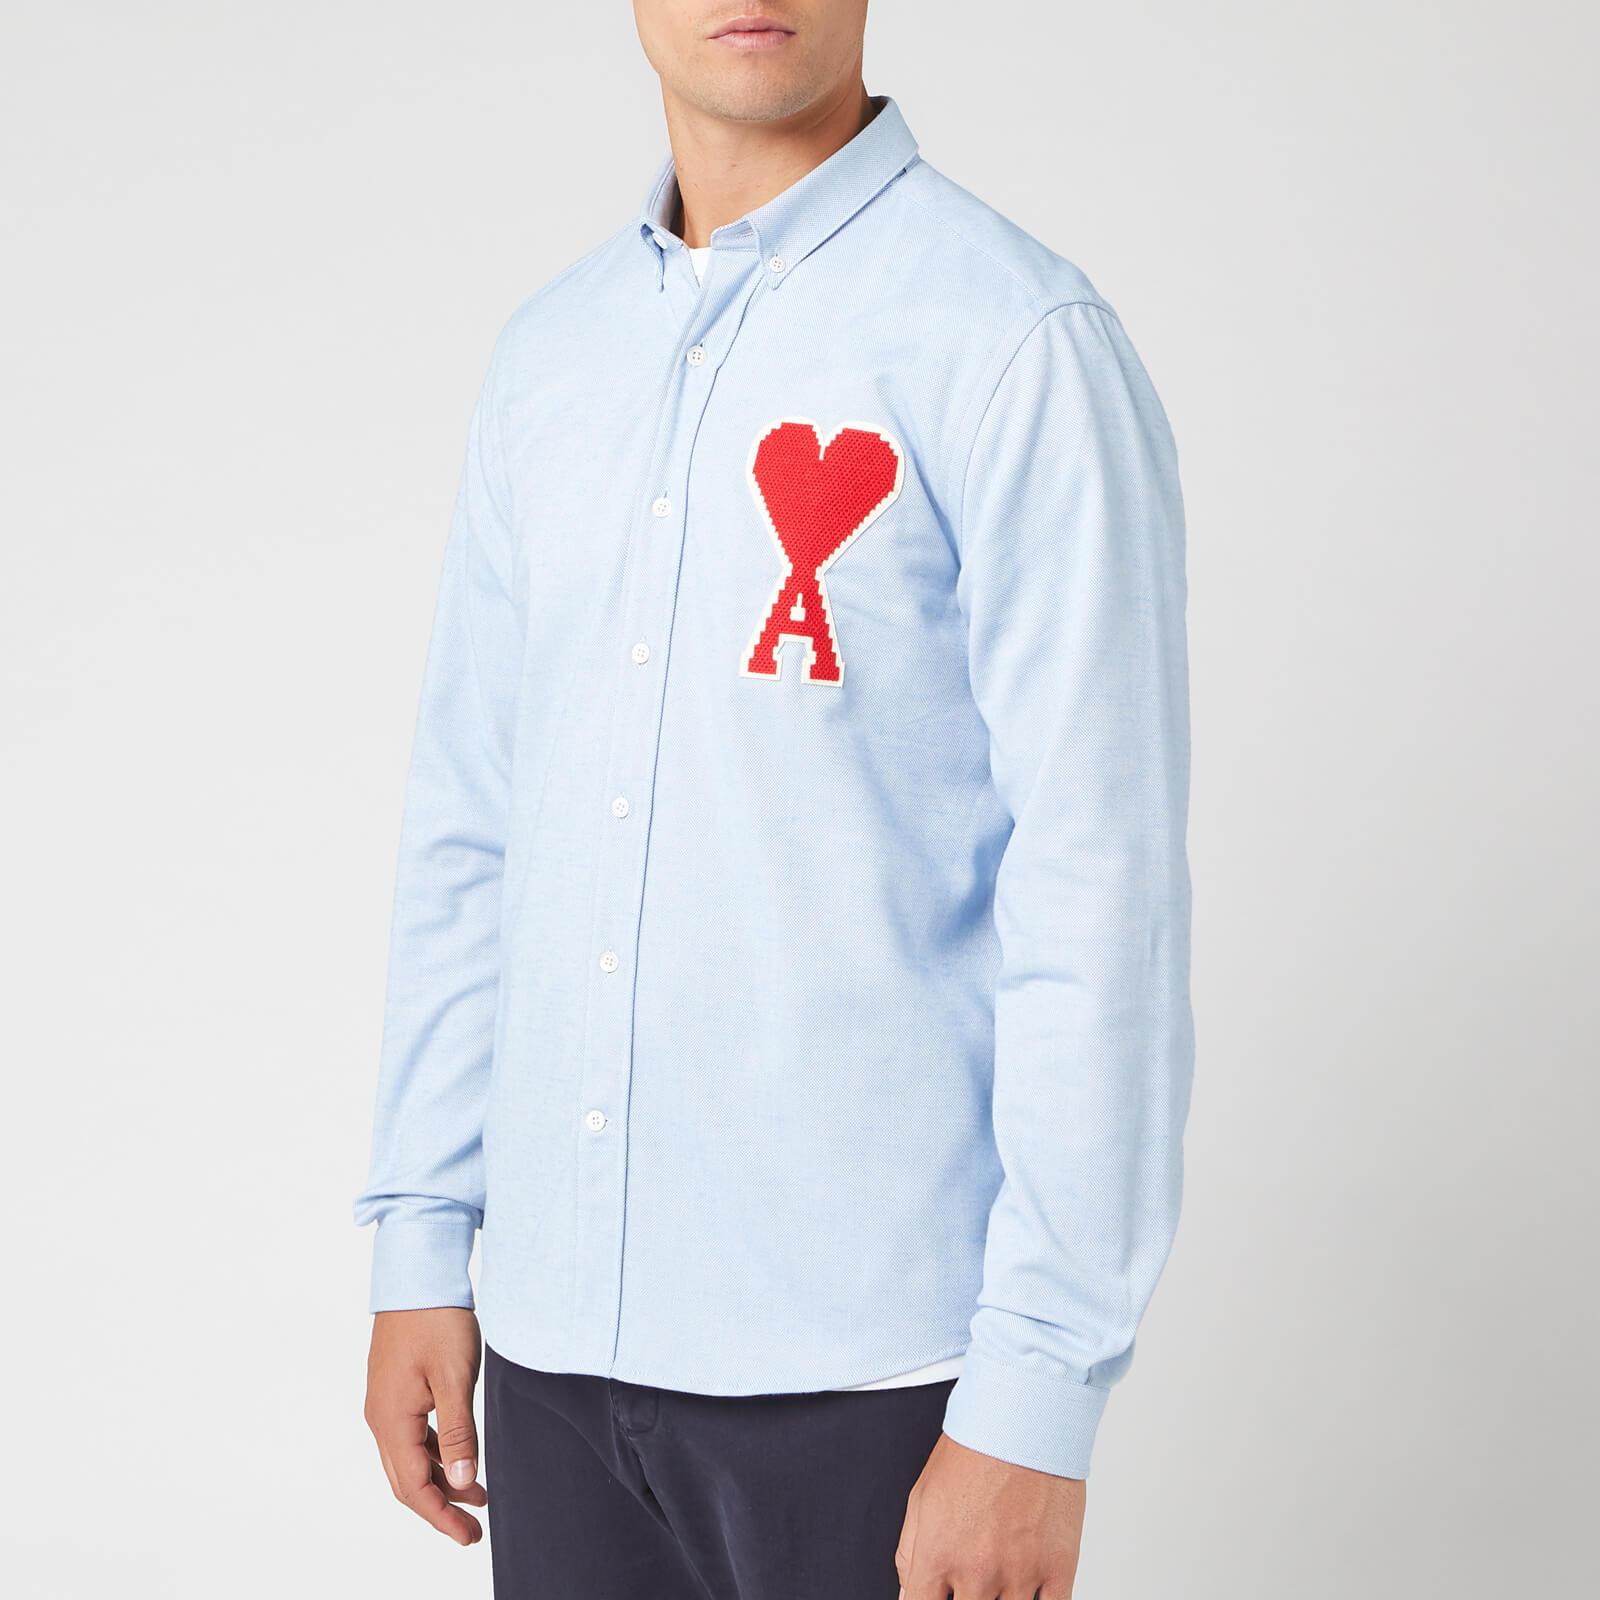 AMI Men's Oxford Long Sleeve Shirt - Bleu Ciel - 40